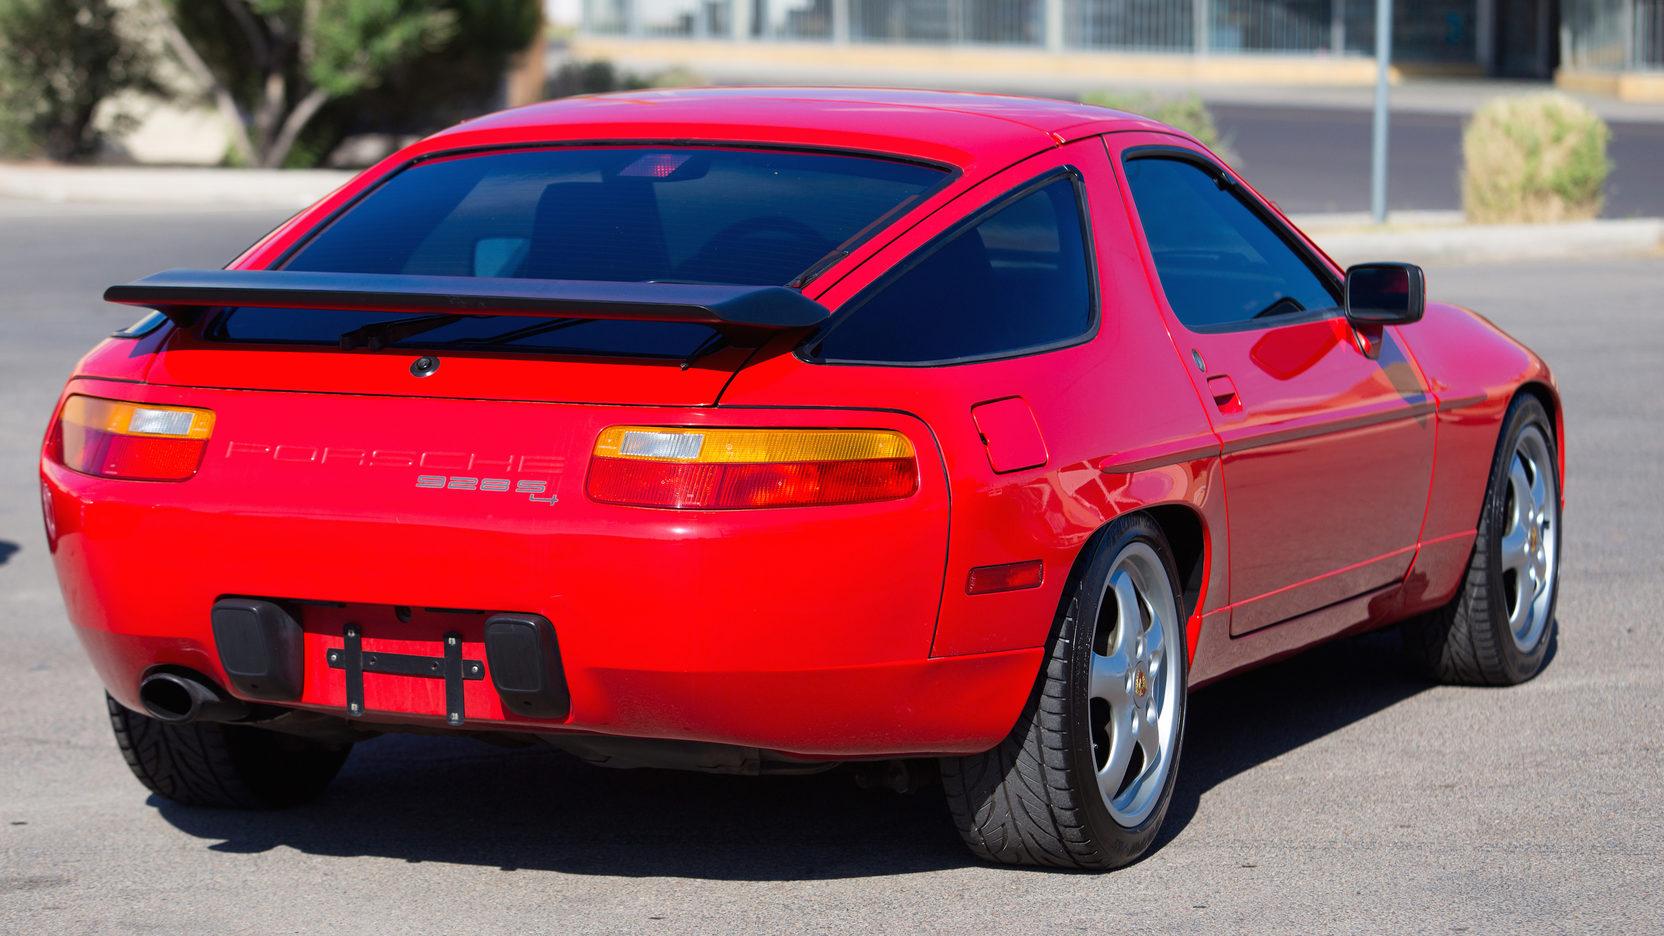 1987 Porsche 928 S4 Rear Three-Quarter